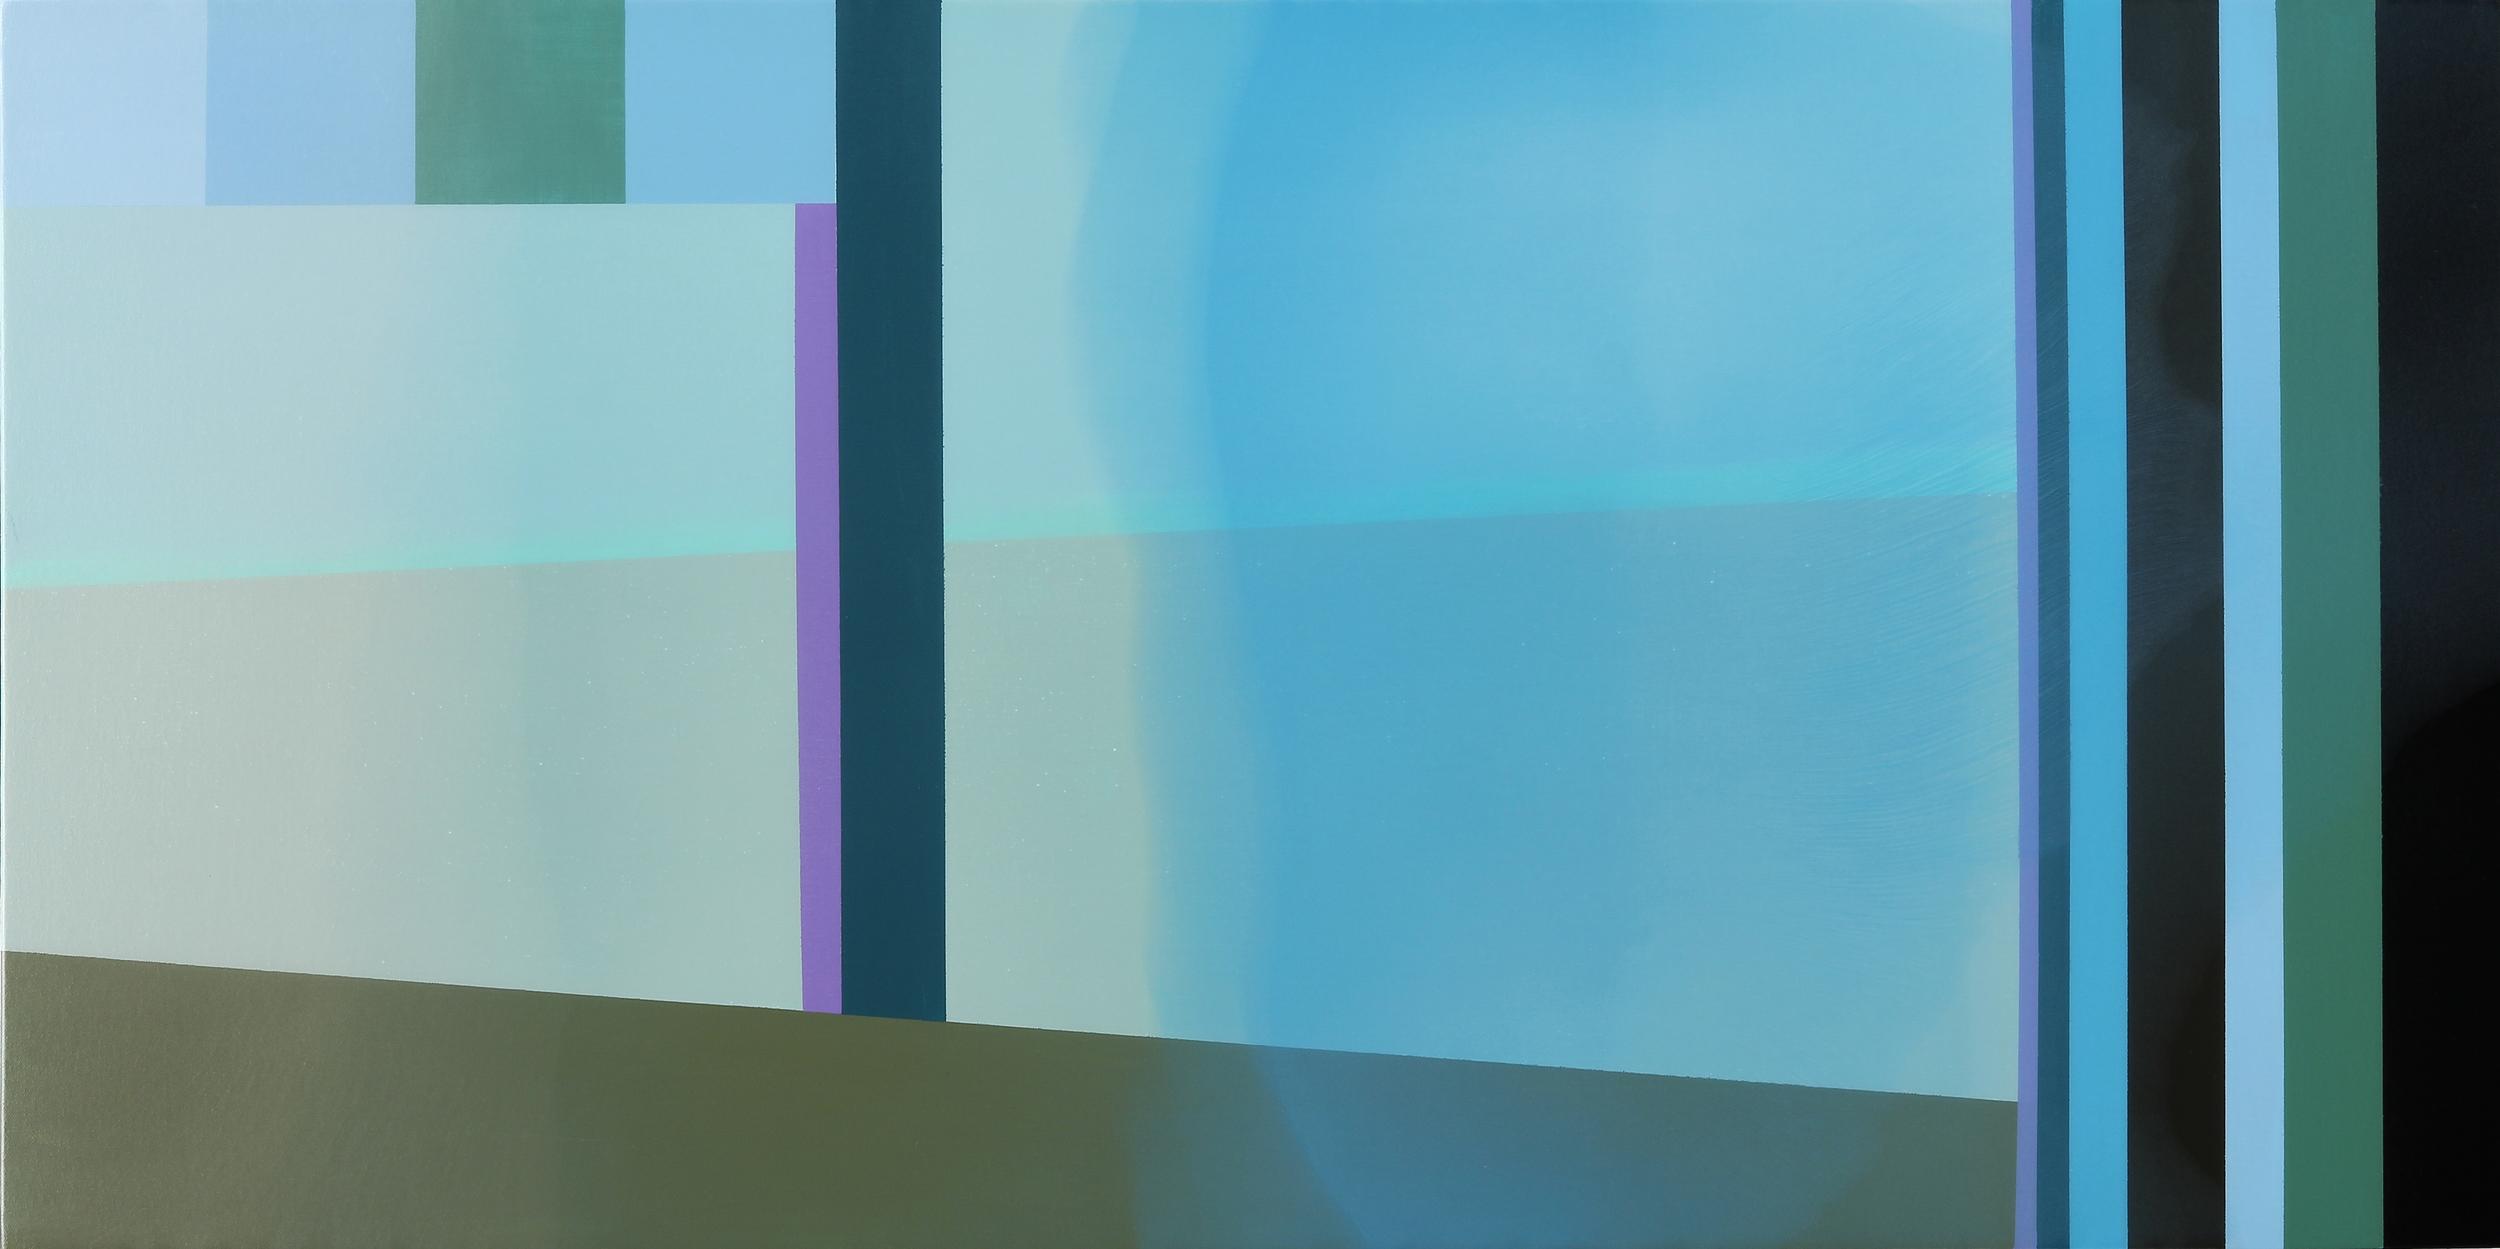 """Start"", Acrylic on canvas over panel, 24"" X 48"", 2015."